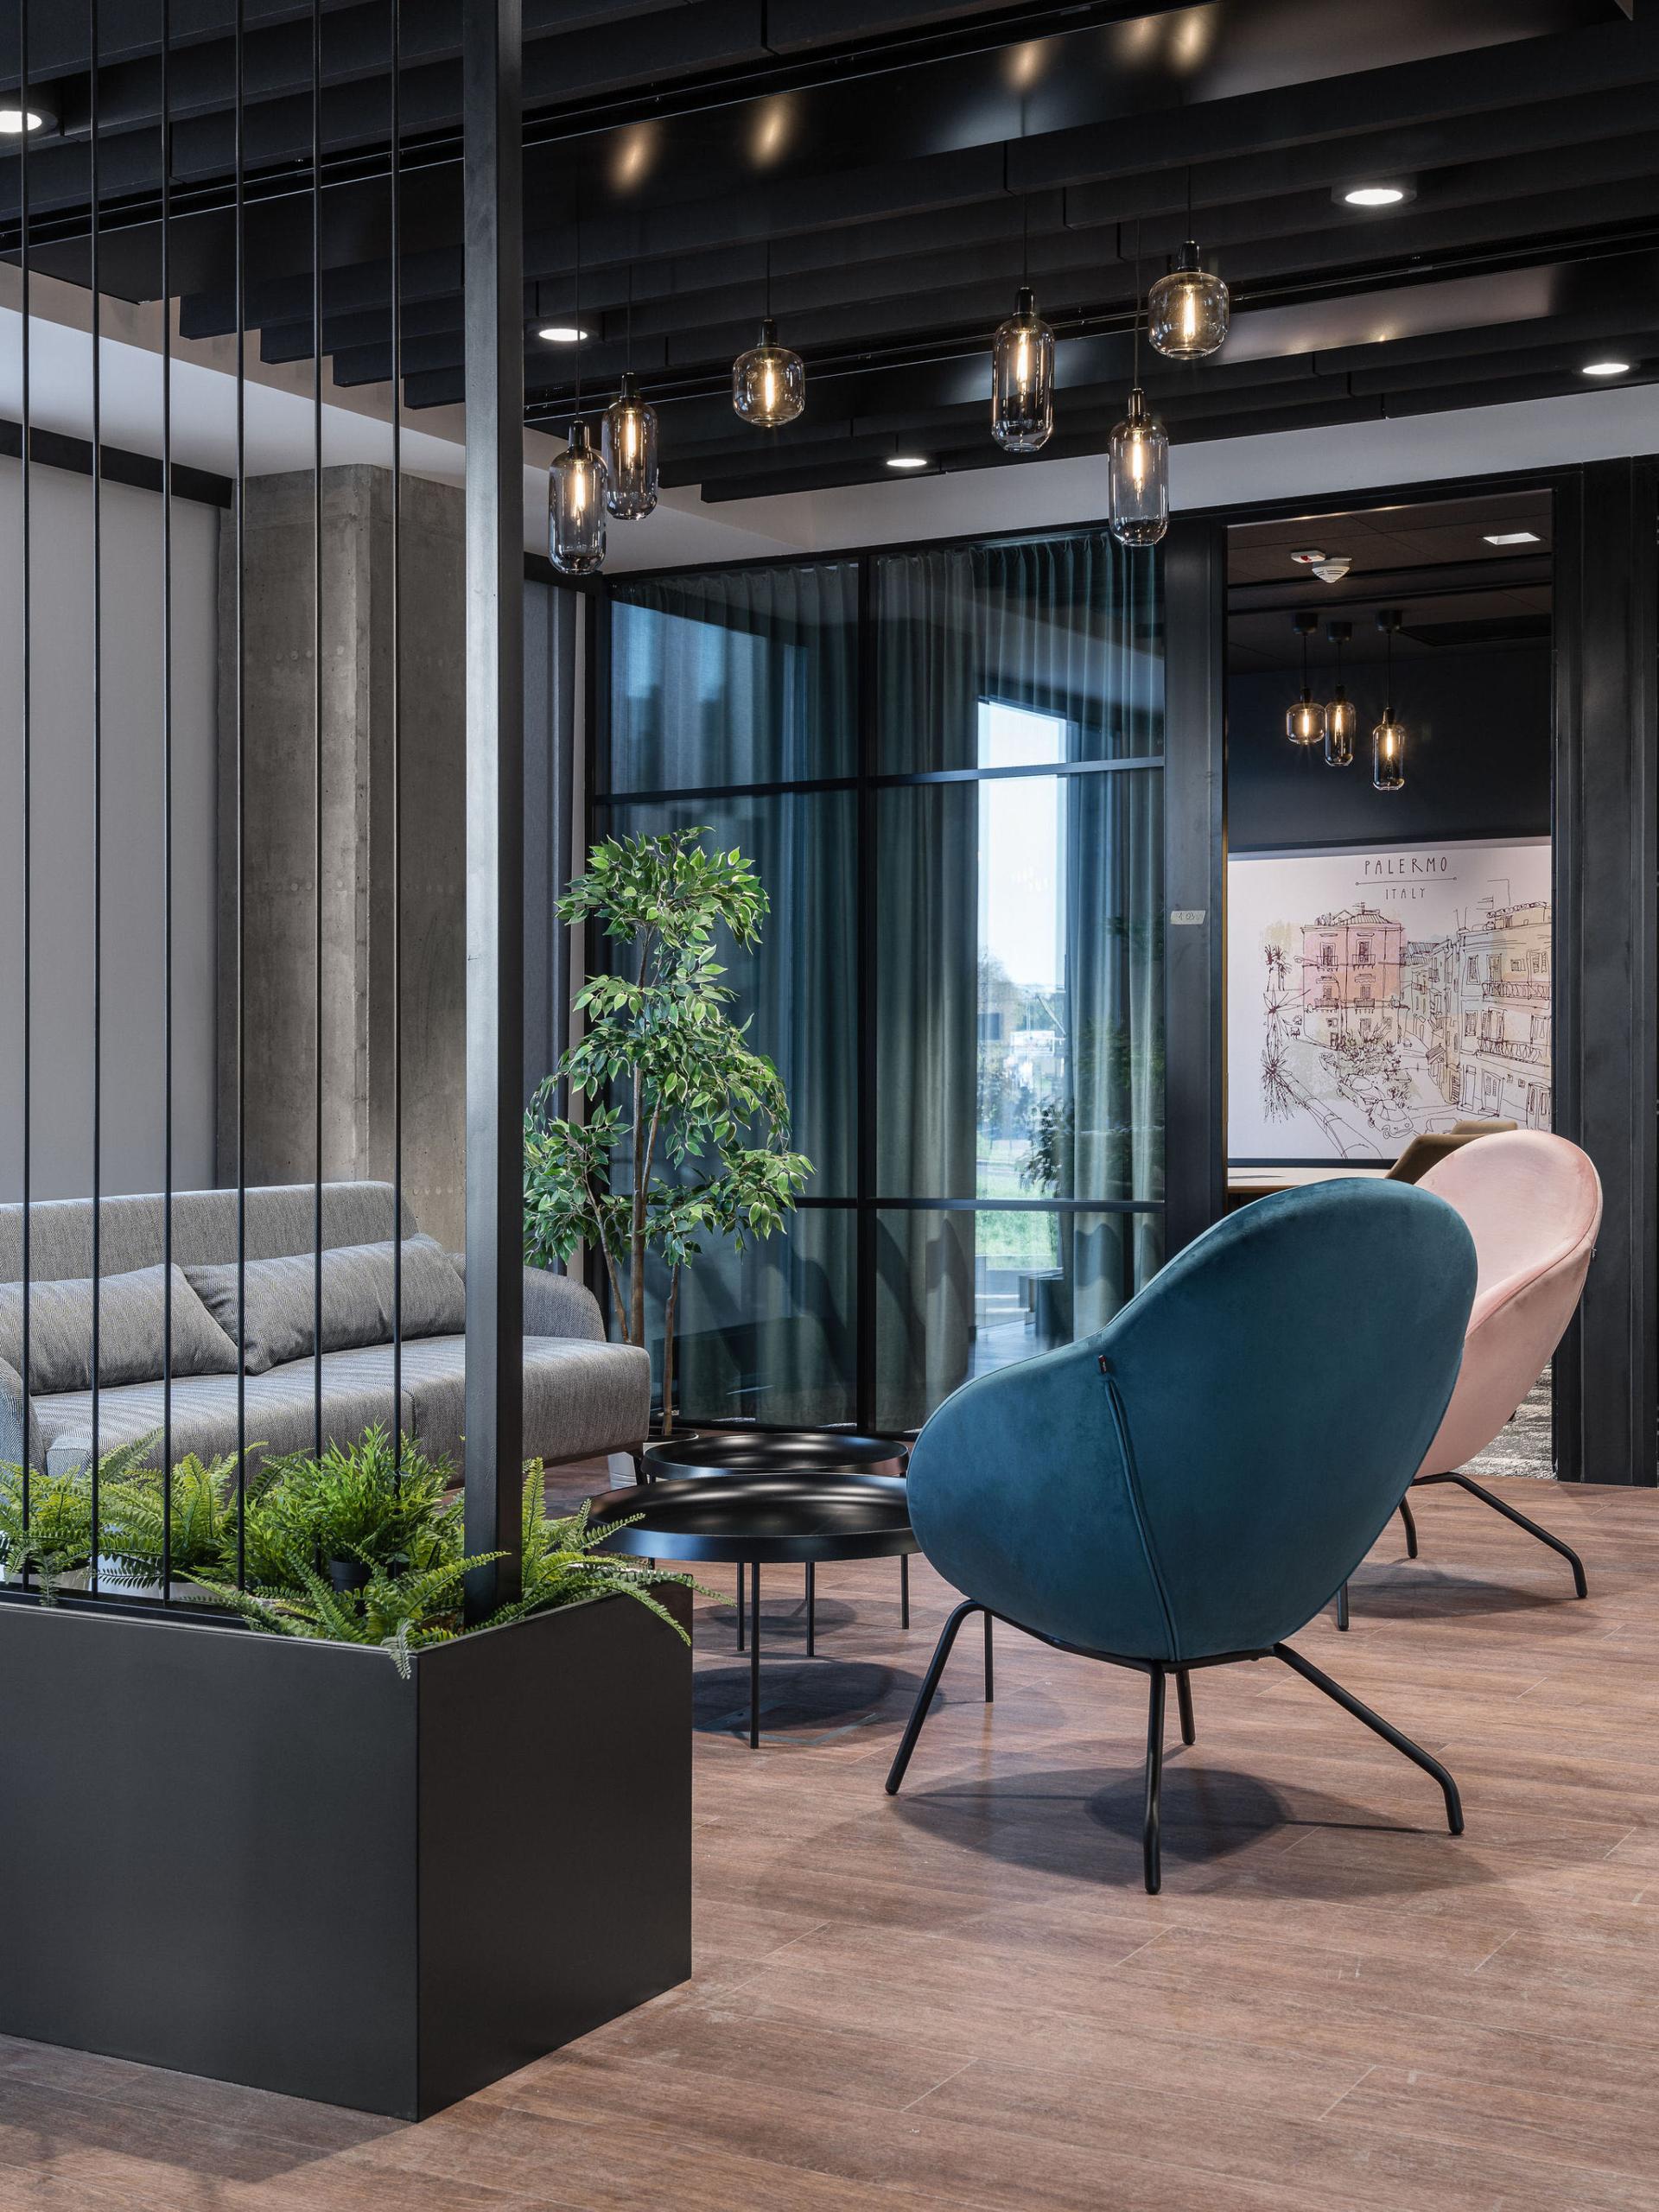 A Look Inside Xceedance's New Krakow Office